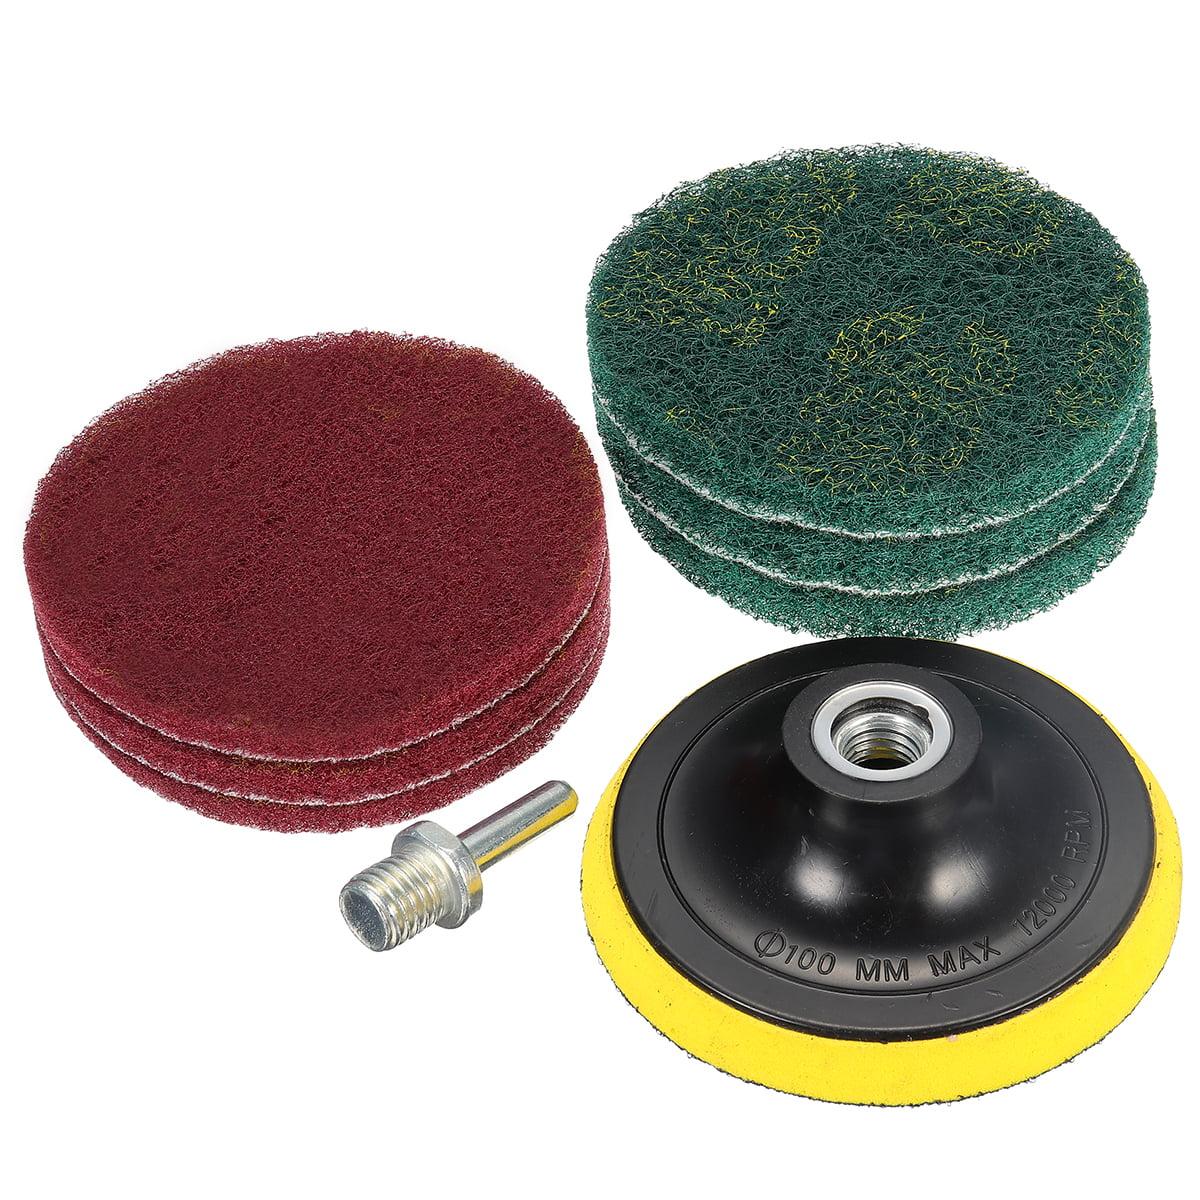 7//5 Inch Brush Power Scrubber Scrub Pad Tile Cleaning Polisher Drill Bathroom